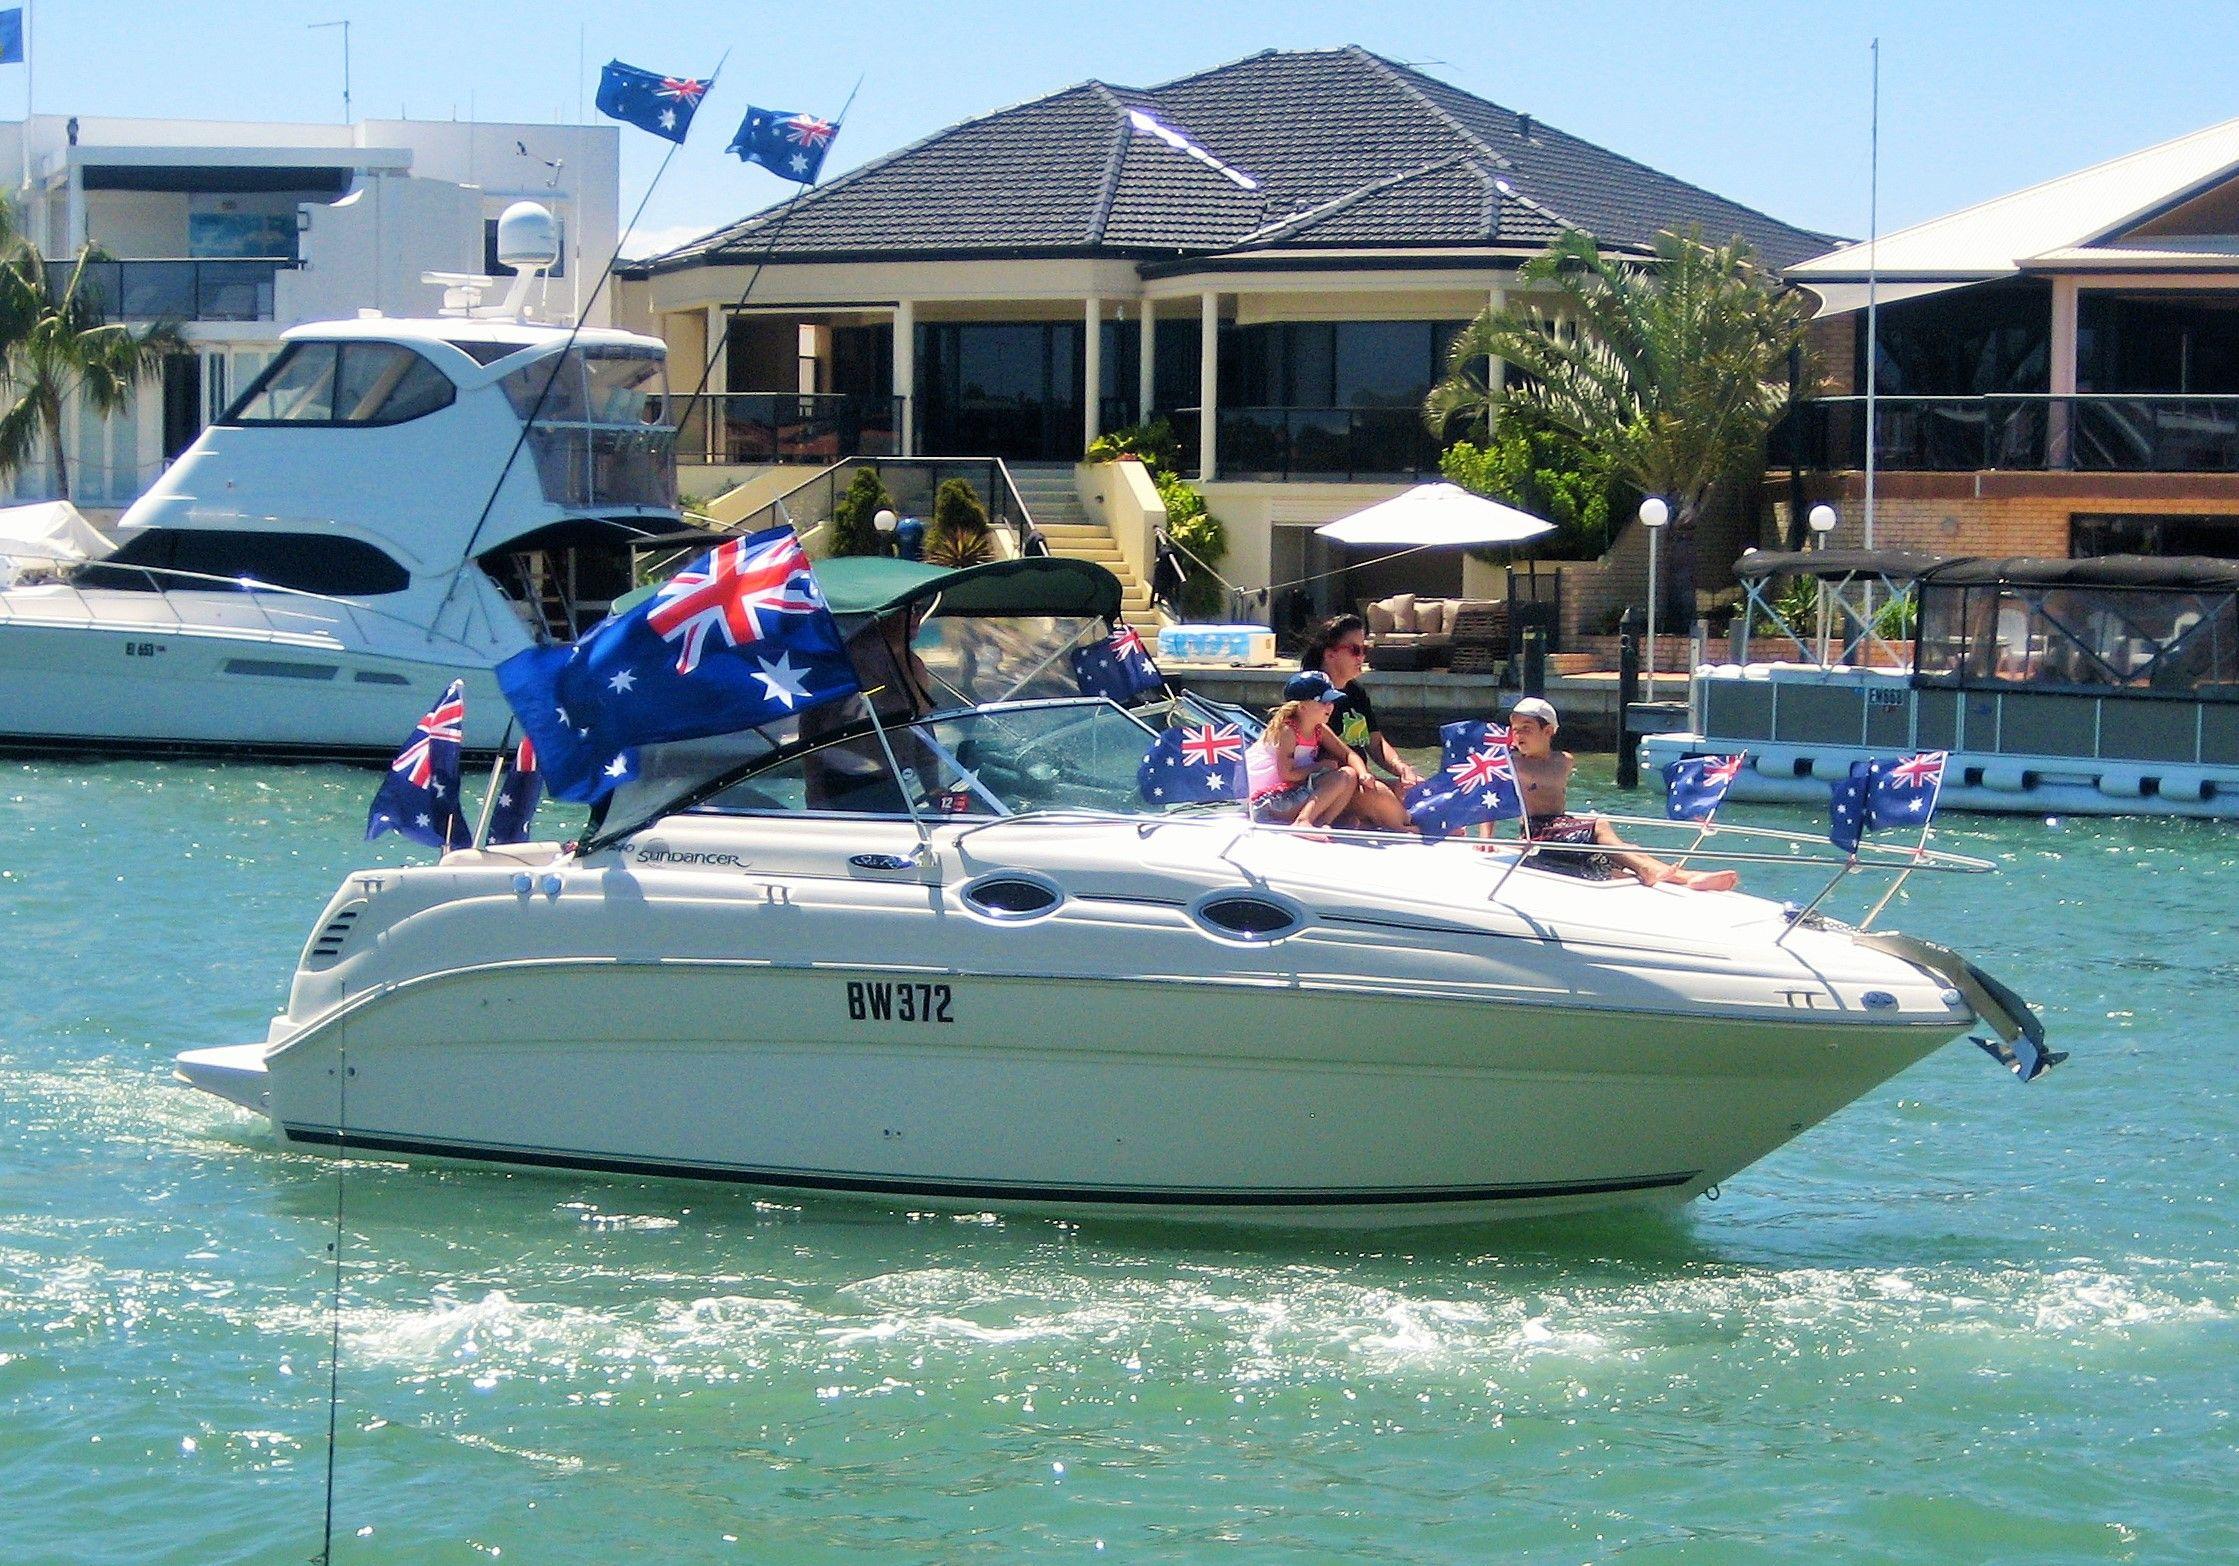 Australia Day 2014 at Port Sails Canal Villa, Mandurah Accommodation